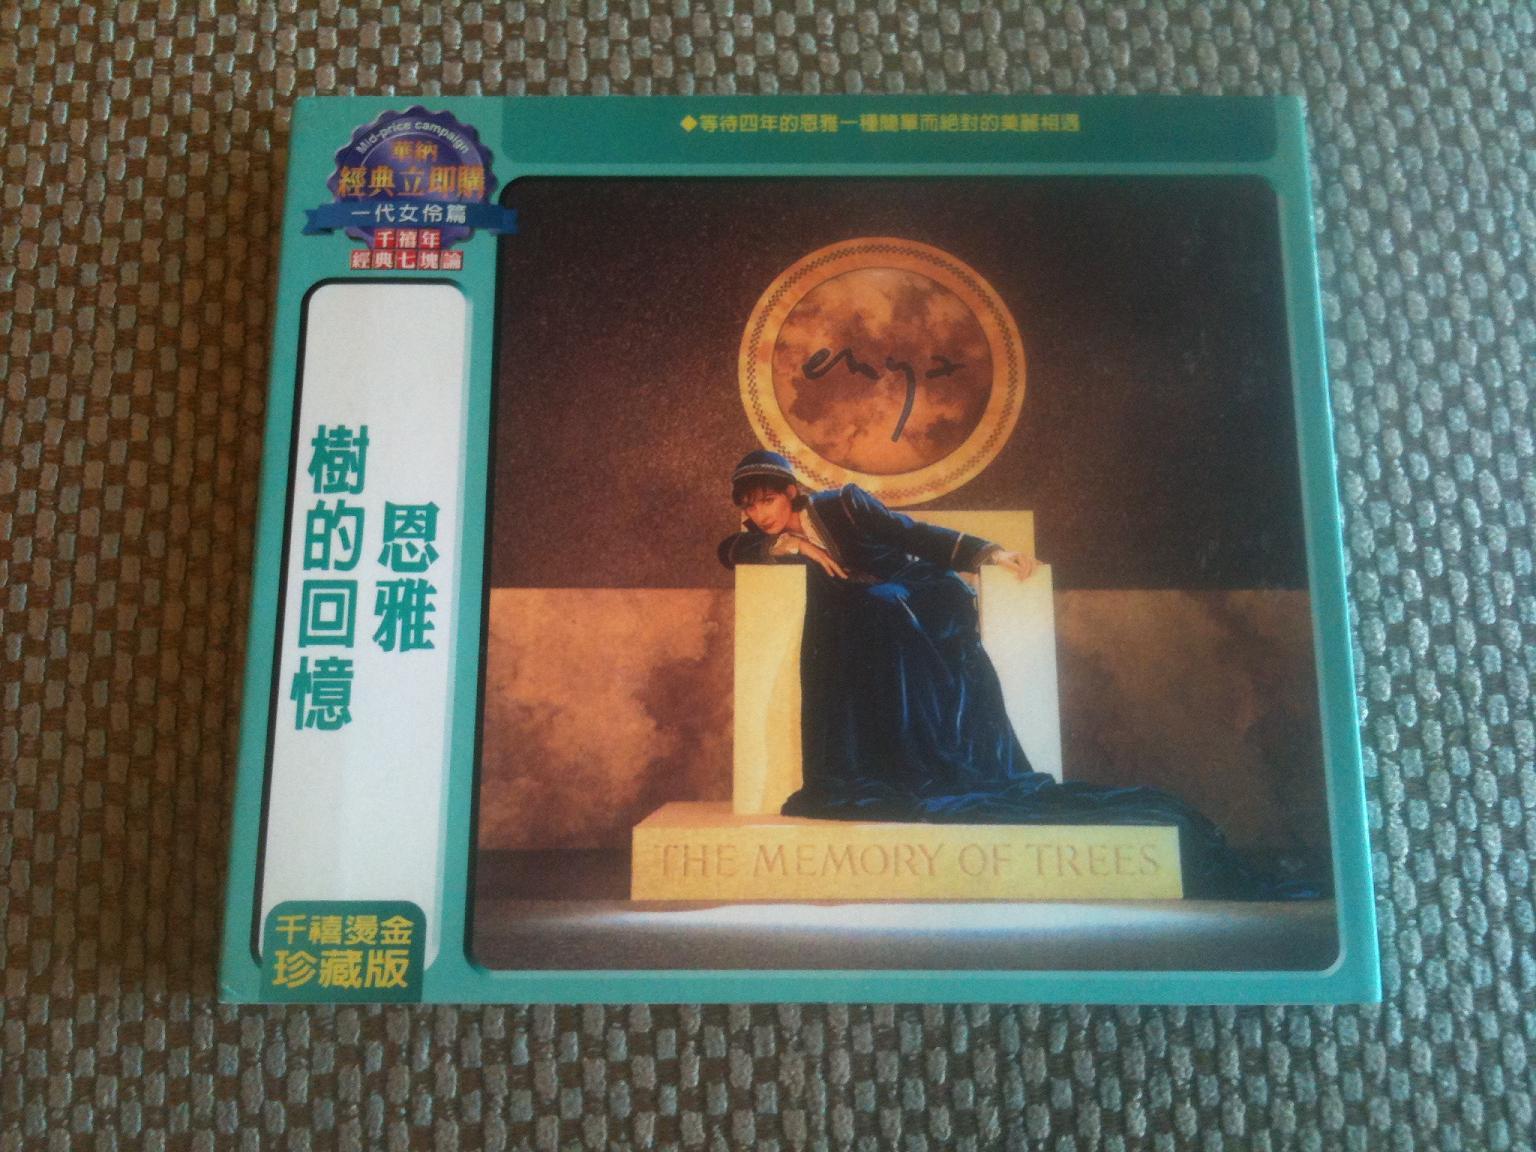 Enya CDs 197.JPG